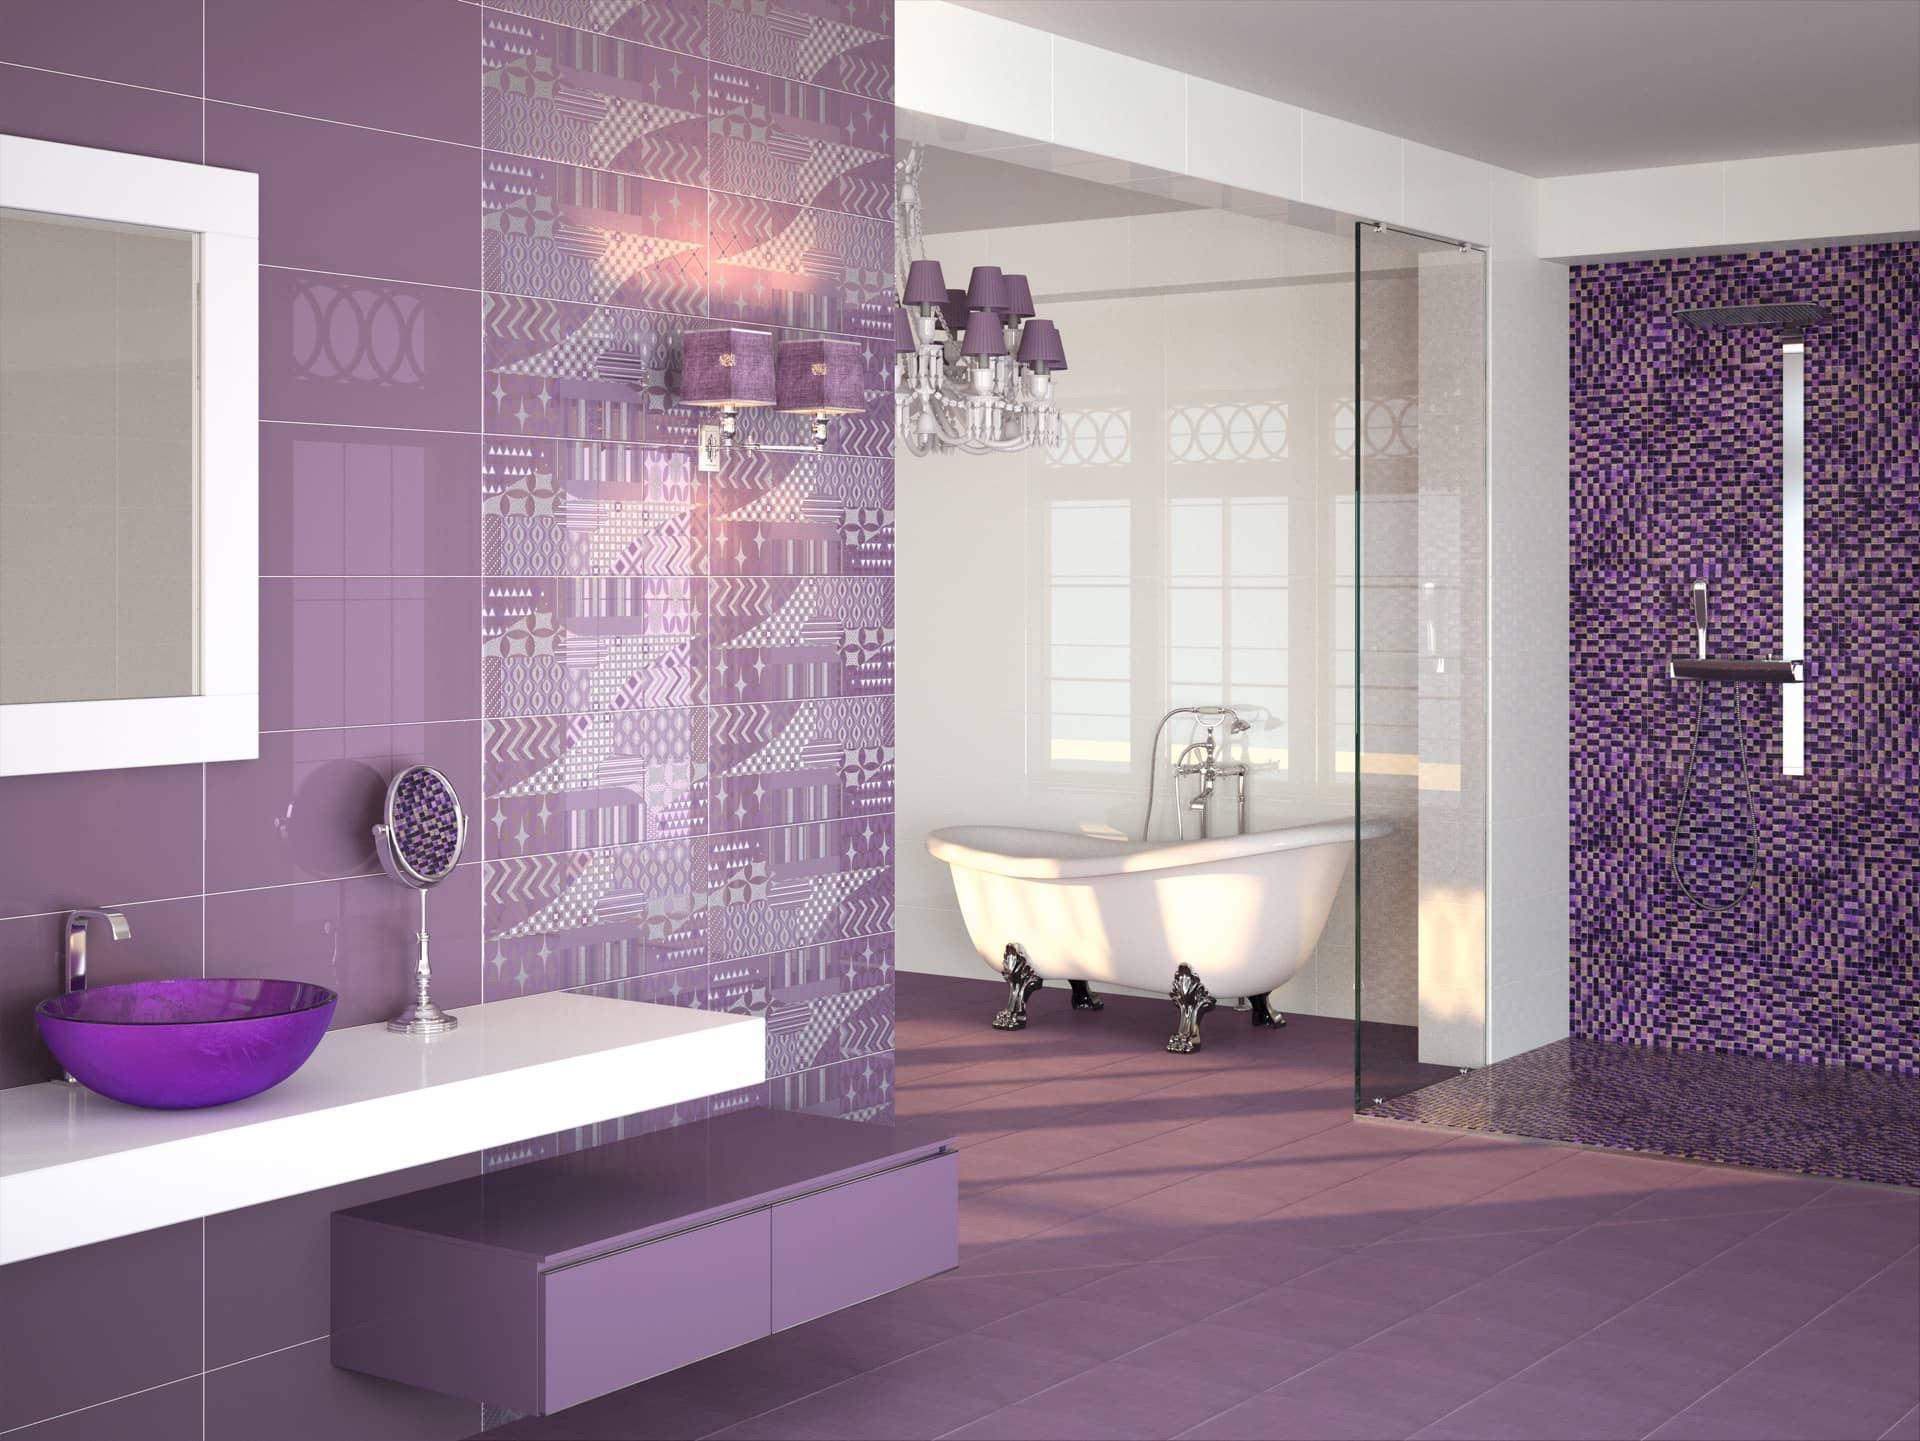 Amb open blanco violeta mosaico Vega dec Sabine copia